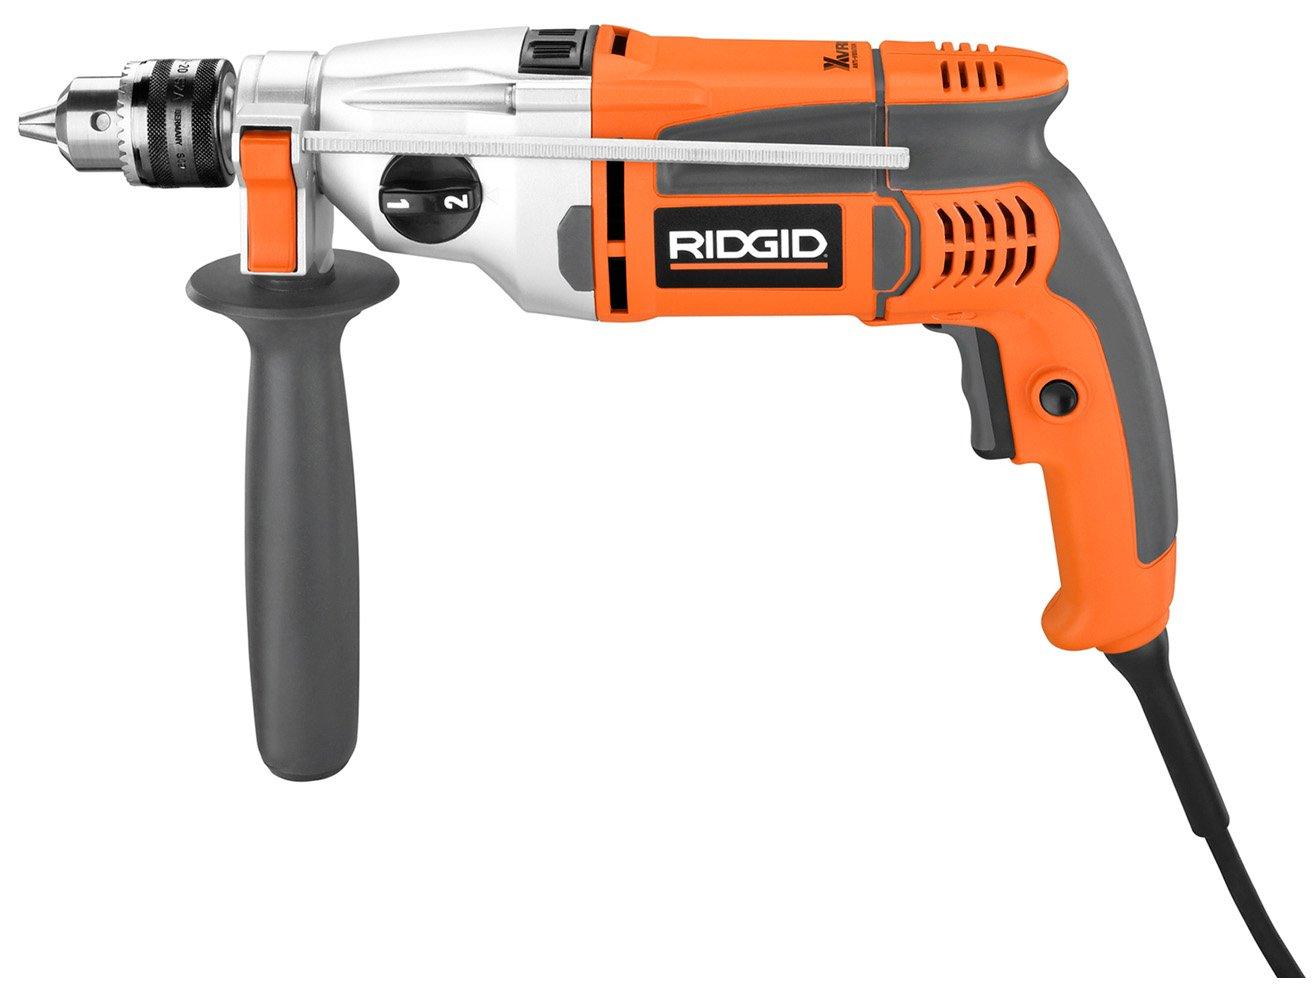 RIDGID ZRR5011 1 2-inch Heavy-Duty VSR Hammer Pulse Drill Renewed